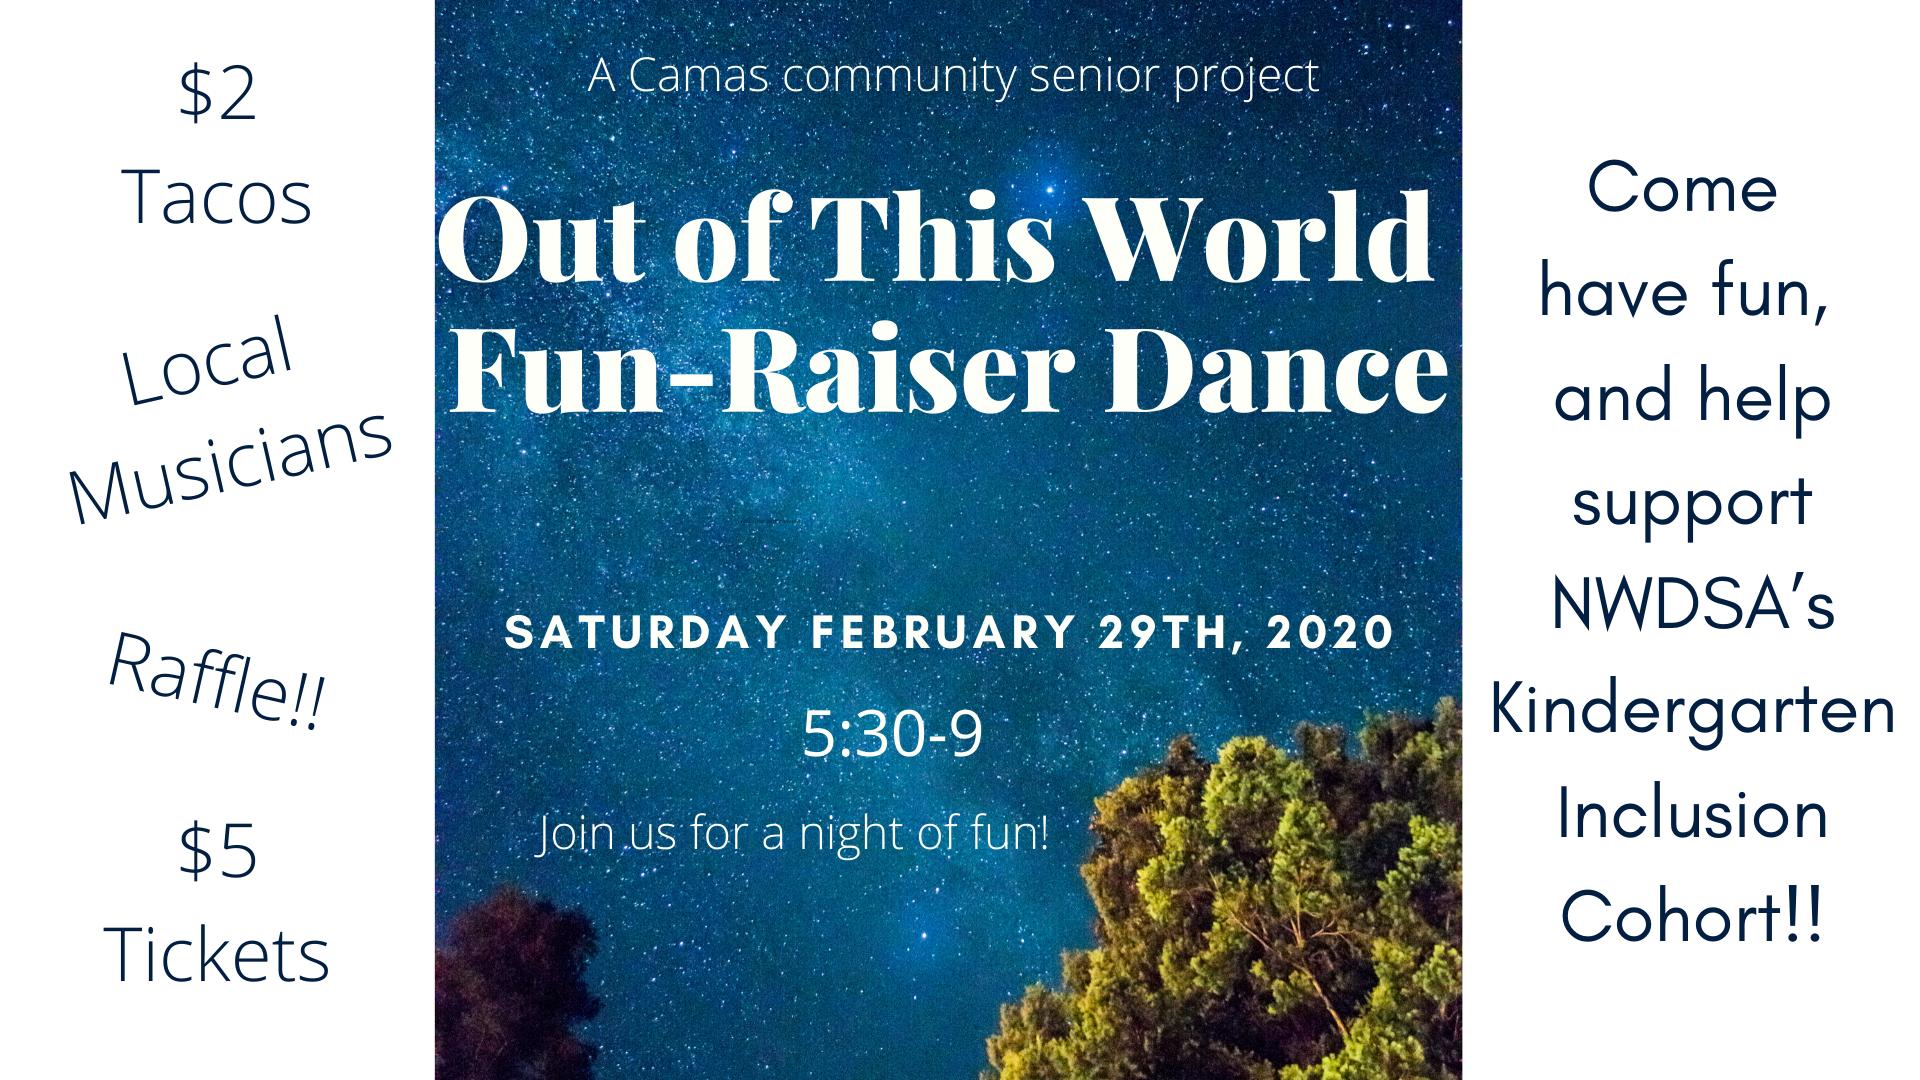 Out of This World Fun-Raiser Dance!